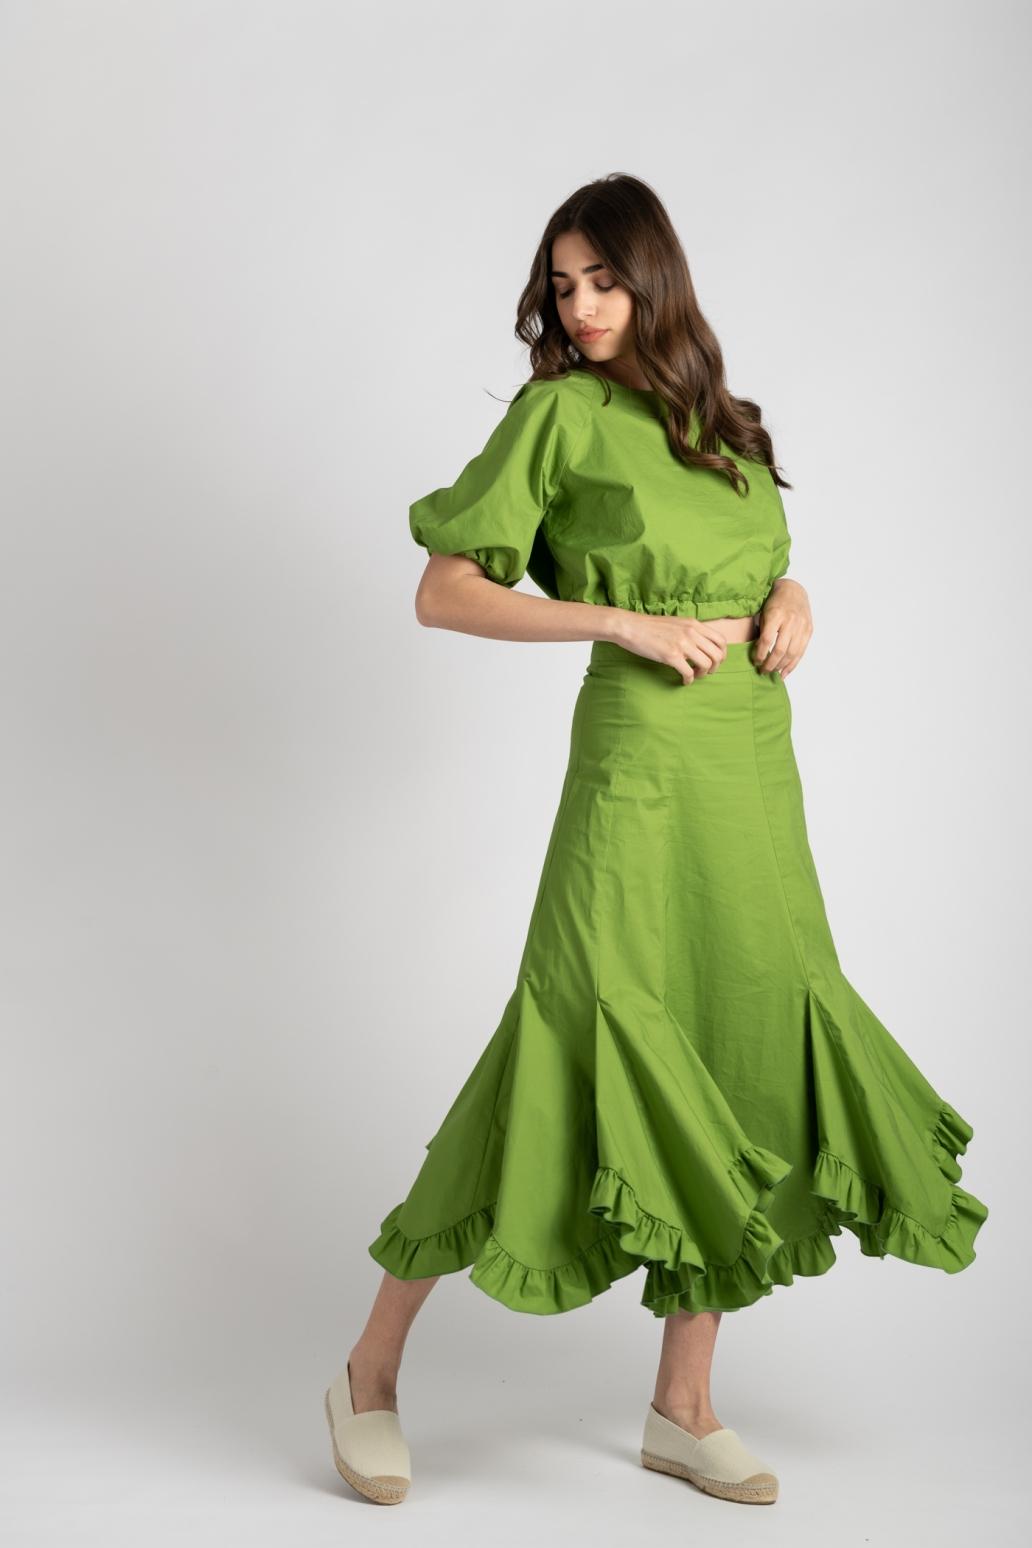 Fusta si top verde You are loved ladonna uai